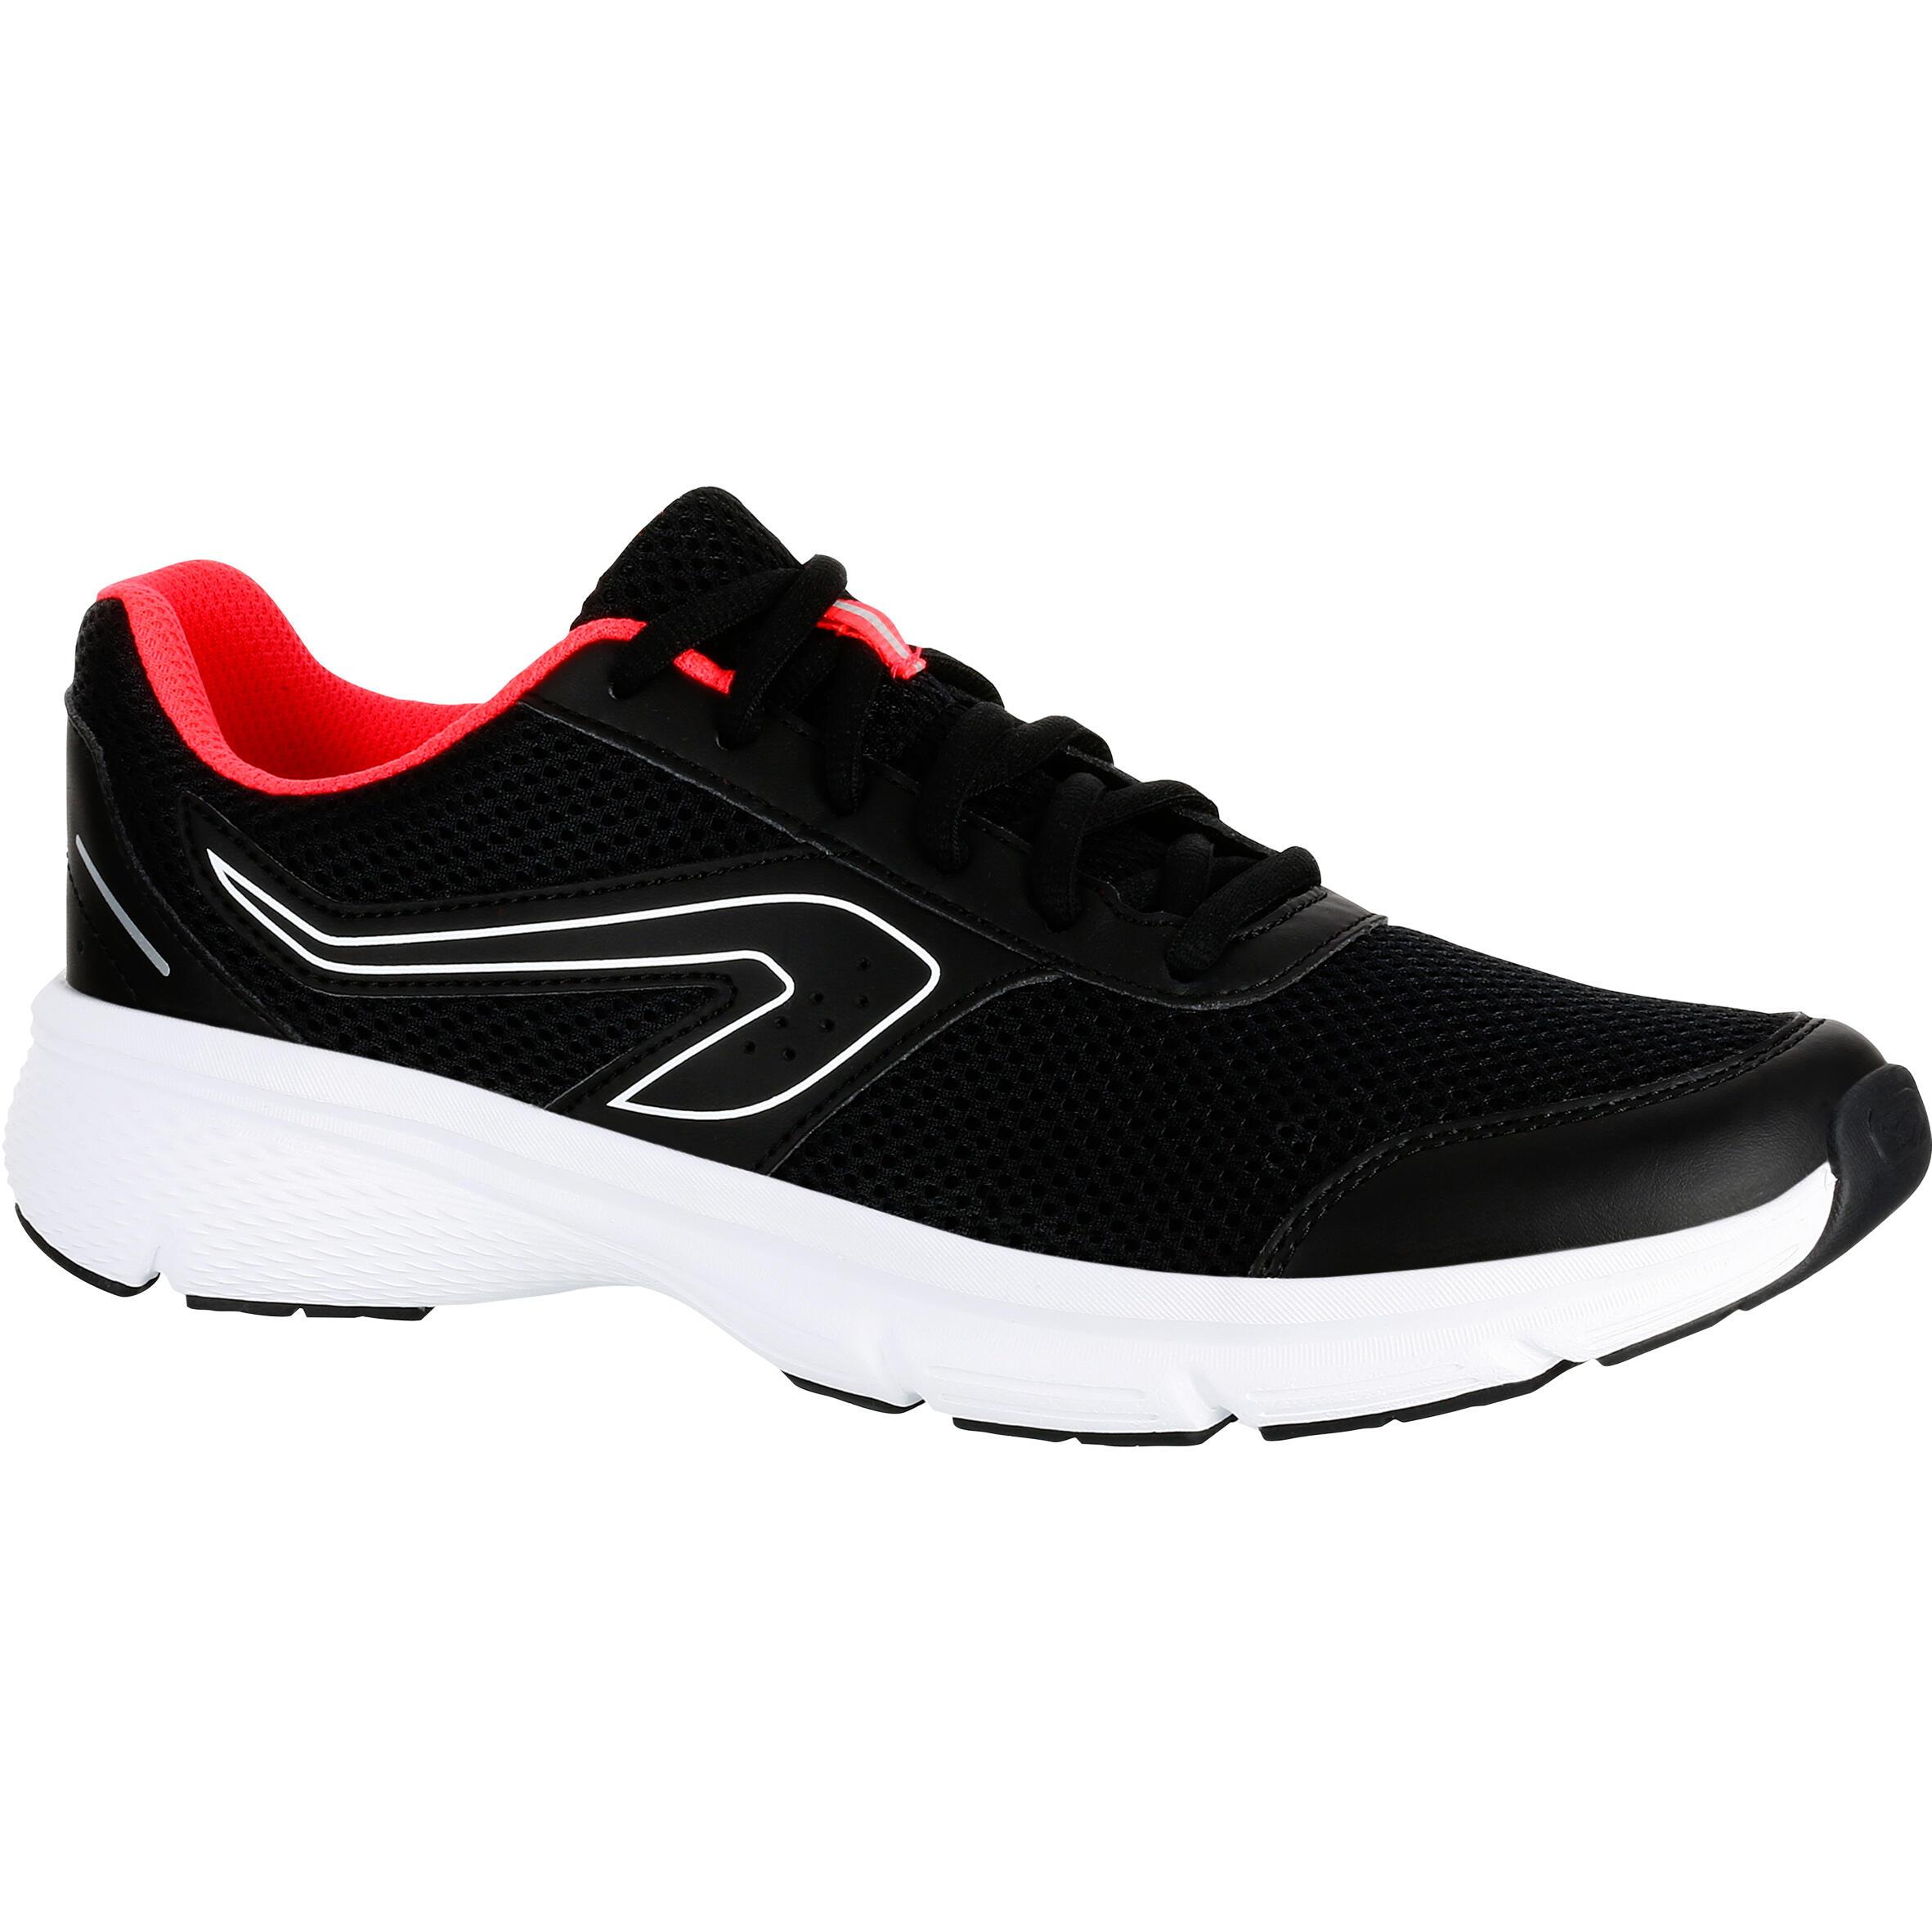 2edf259e5 Comprar Zapatillas de Running Online   Decathlon